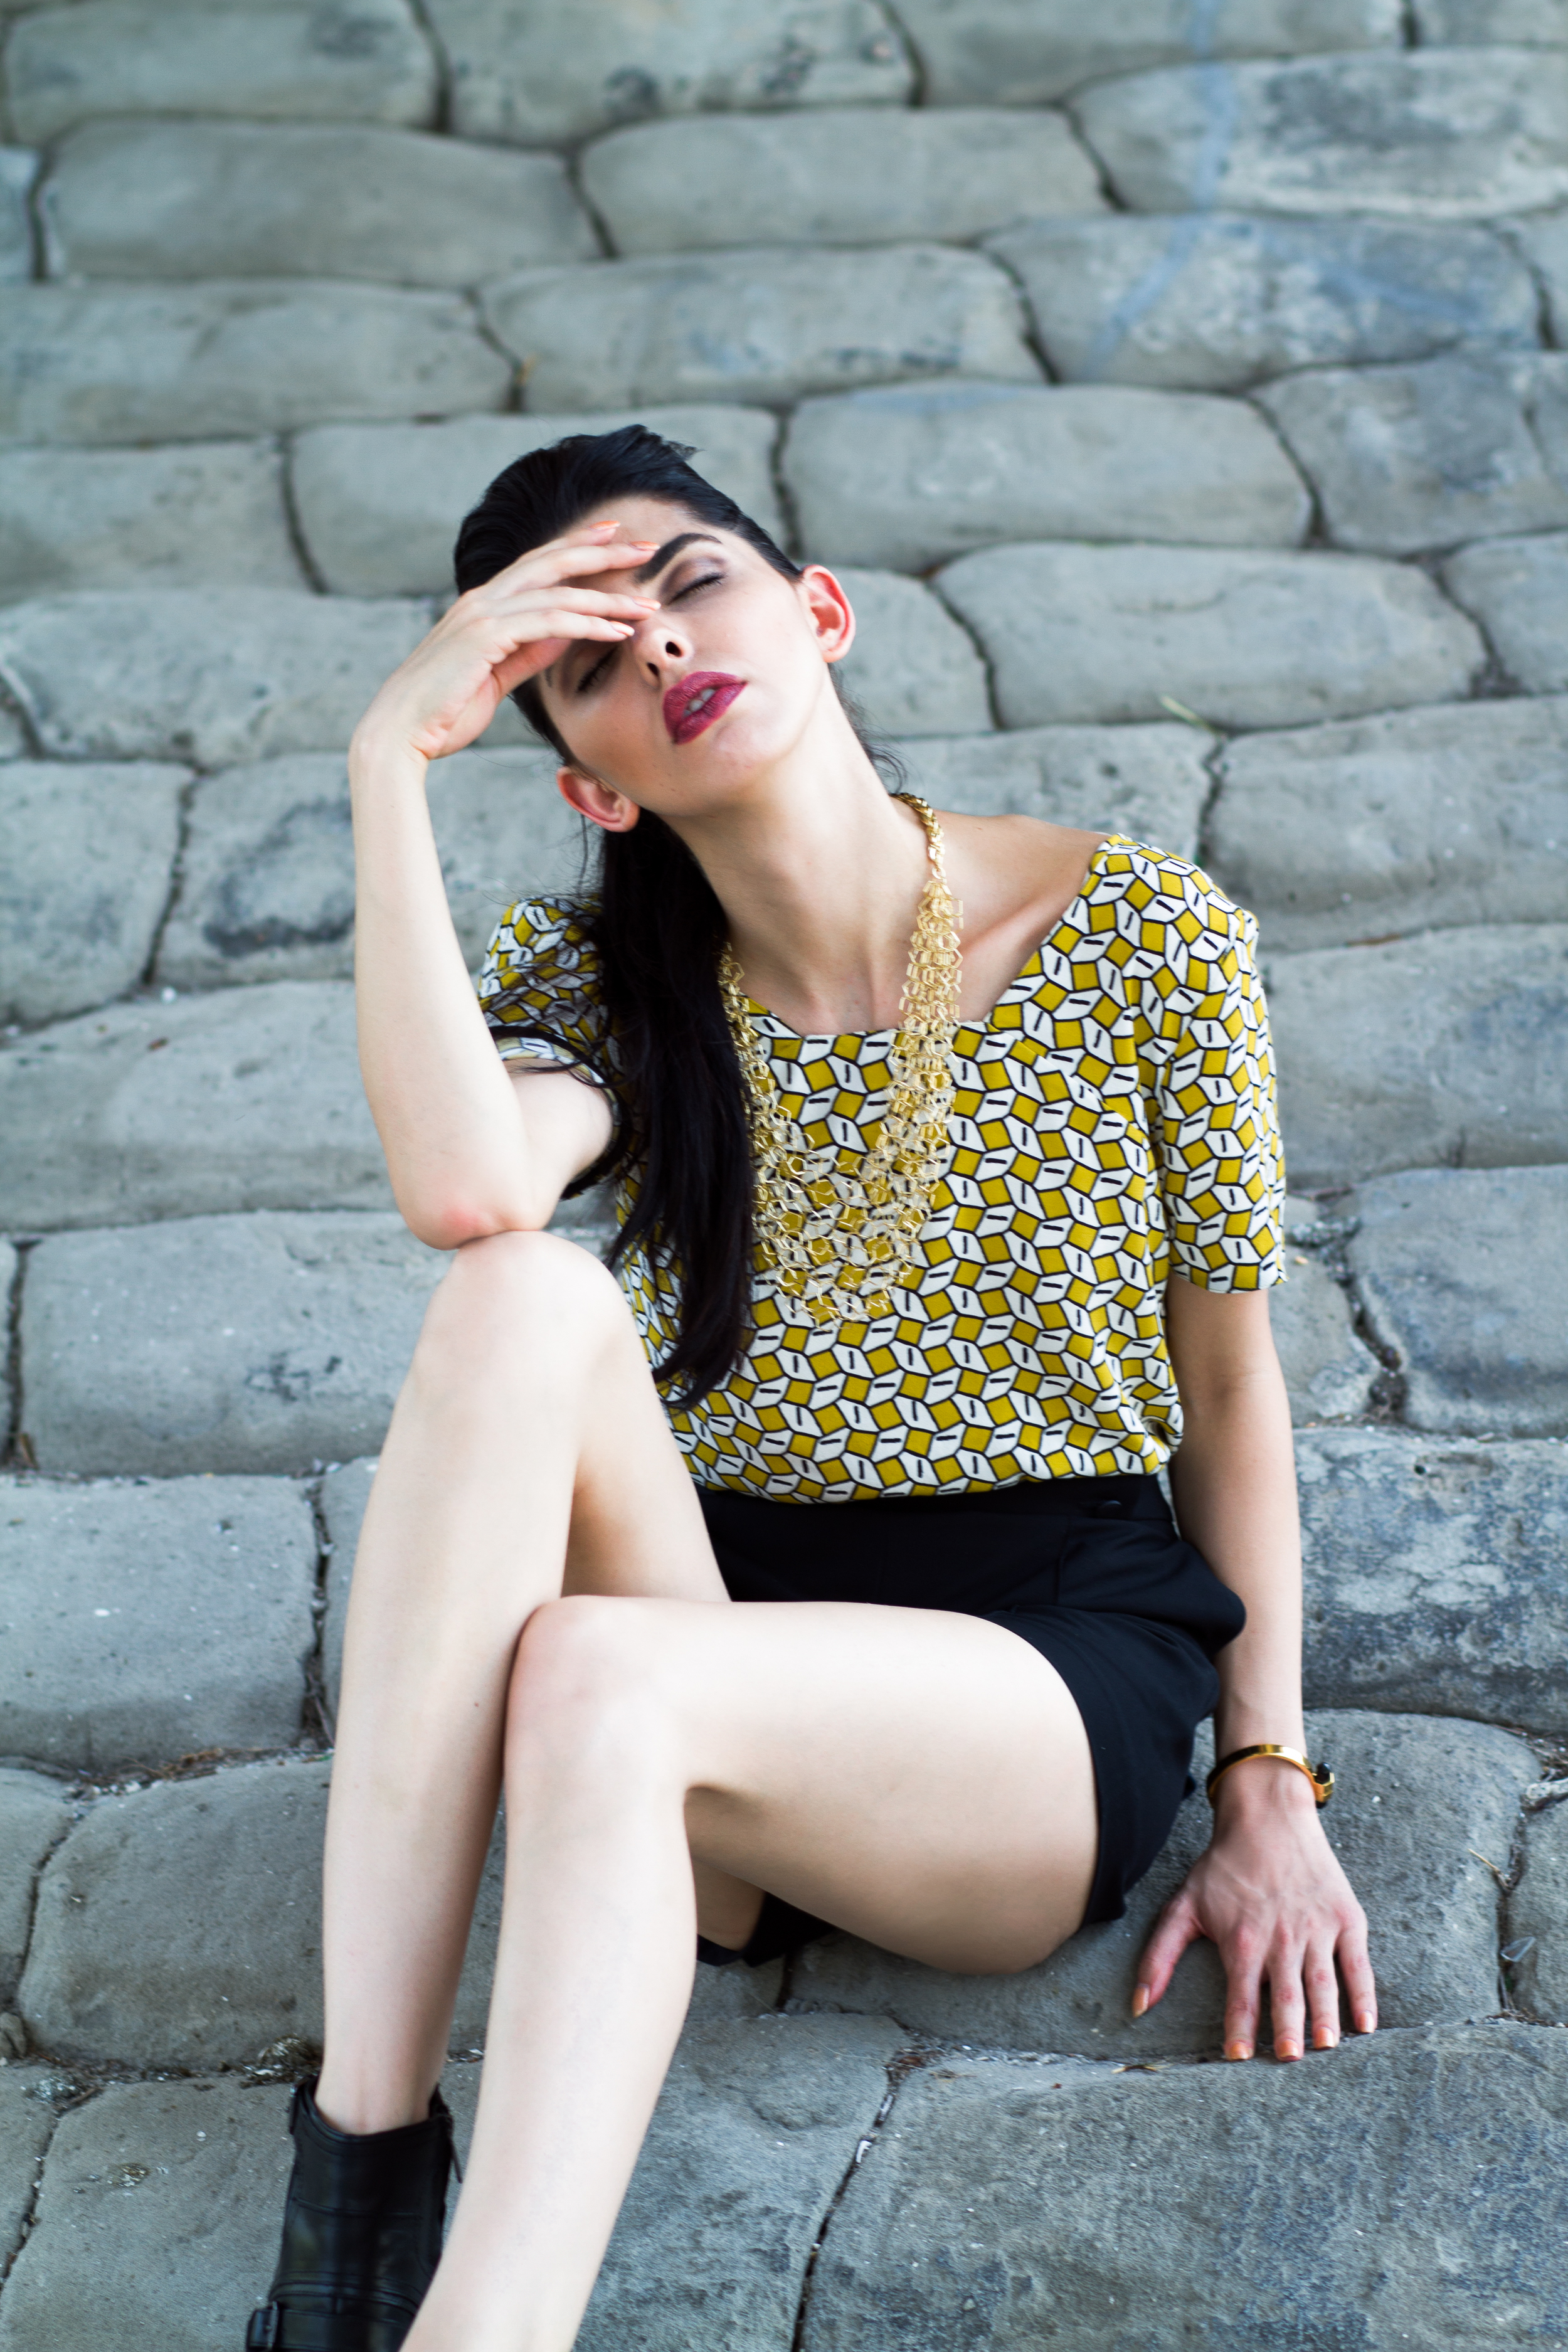 fashioneditorial_AlexisP_vaniaelise-2.jpg